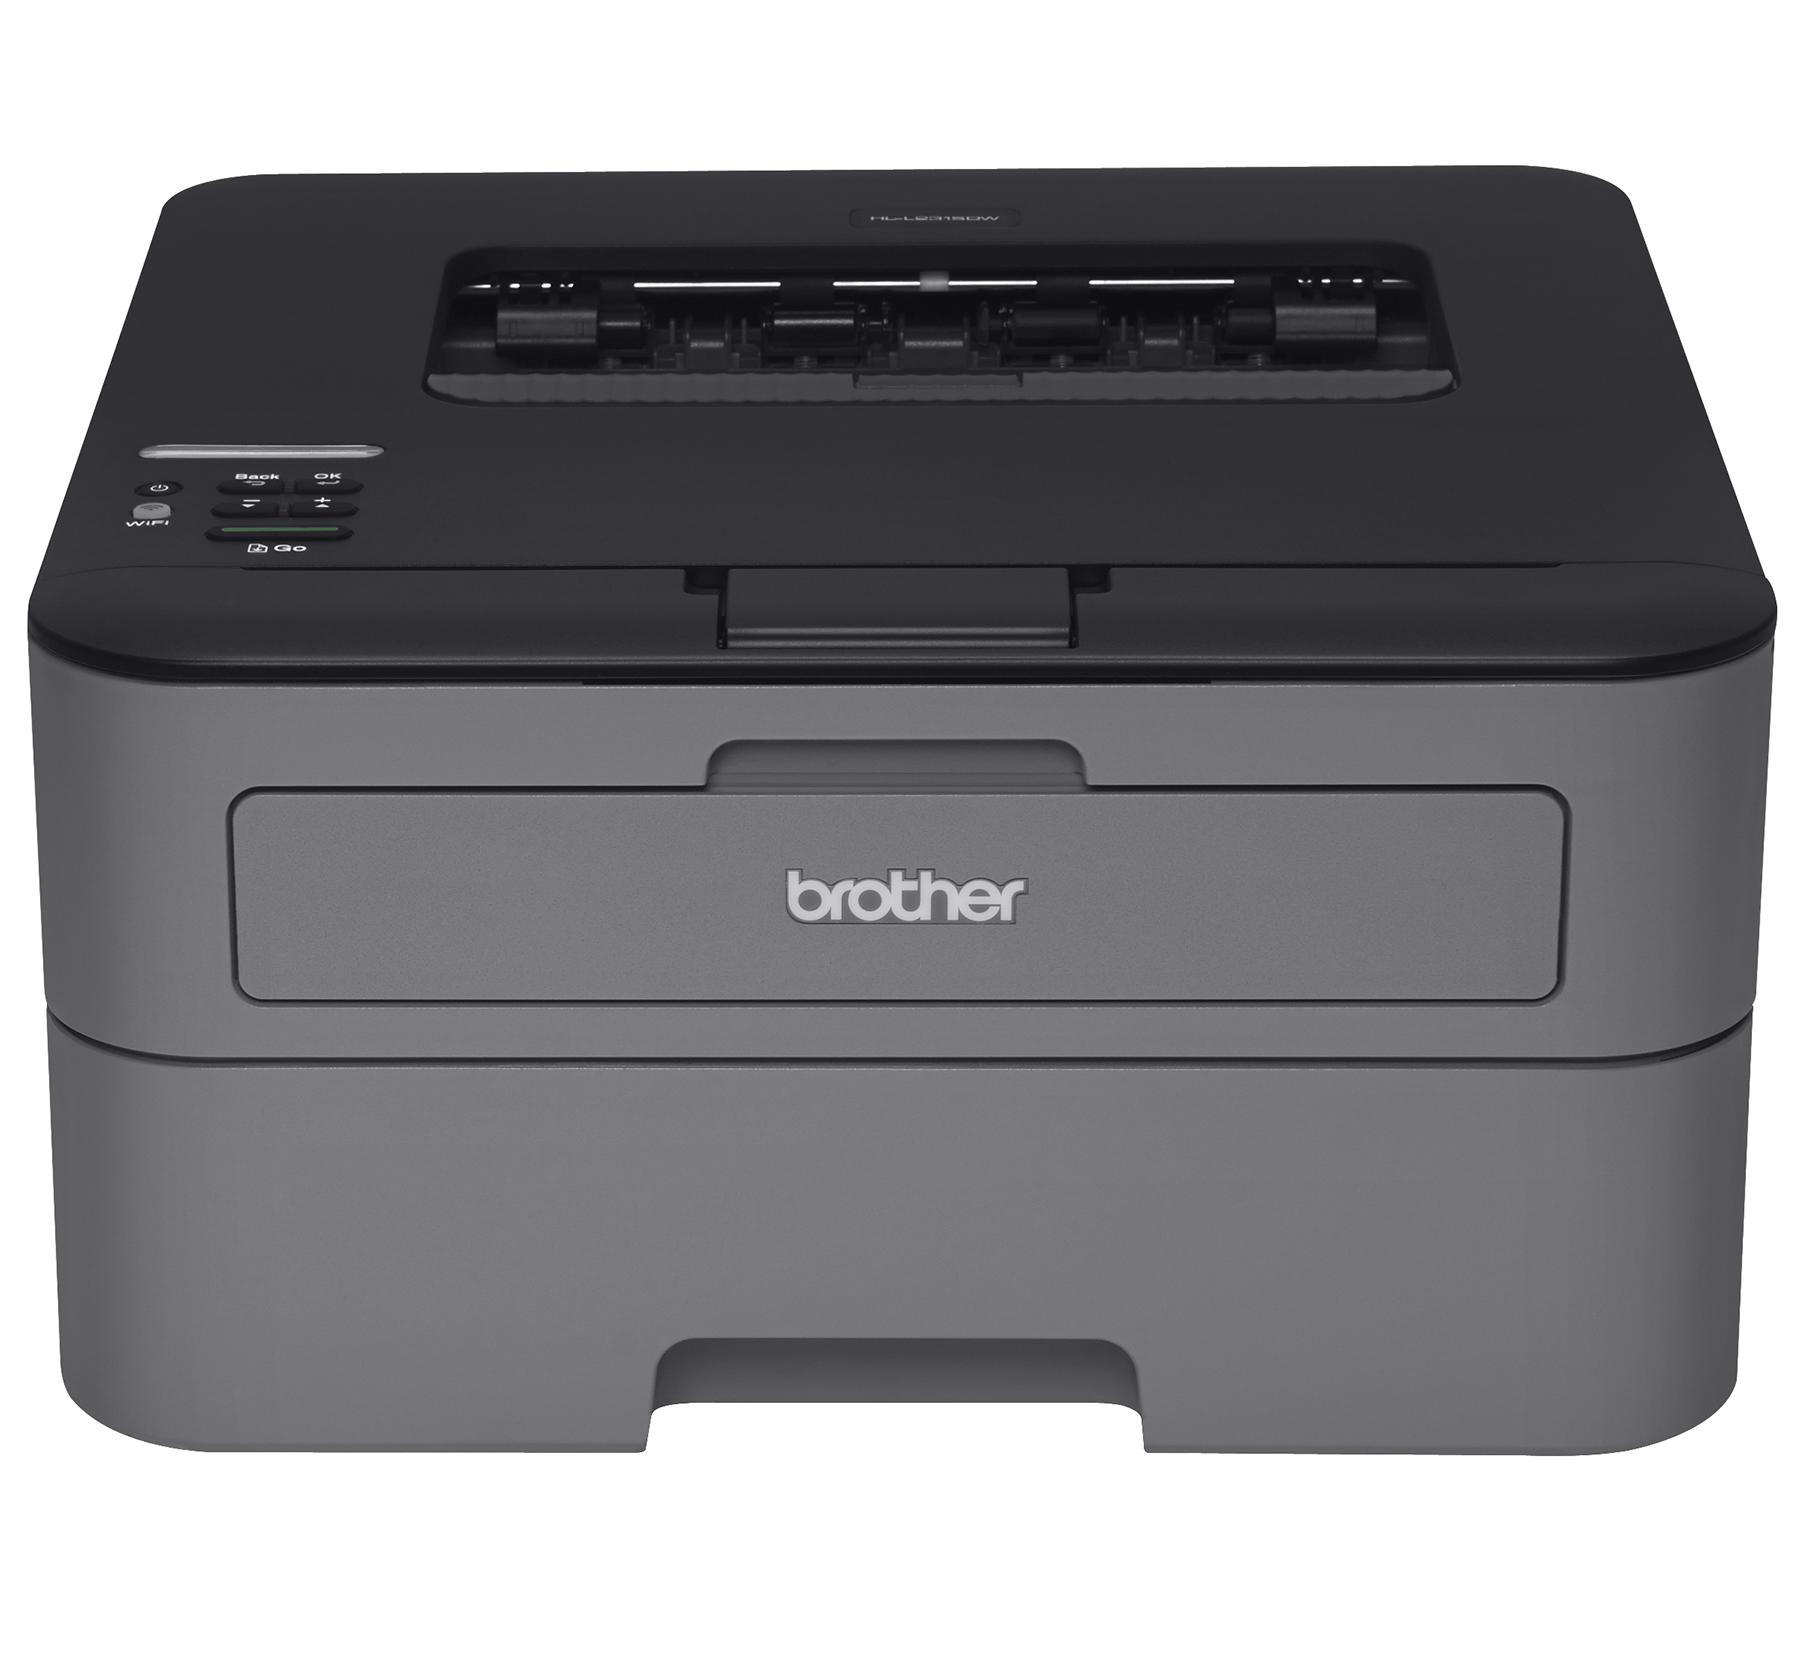 Brother L2315DW Monochrome Wireless Duplex Laser Printer (Refurbished) $69.99+ Free Shipping from Walmart.